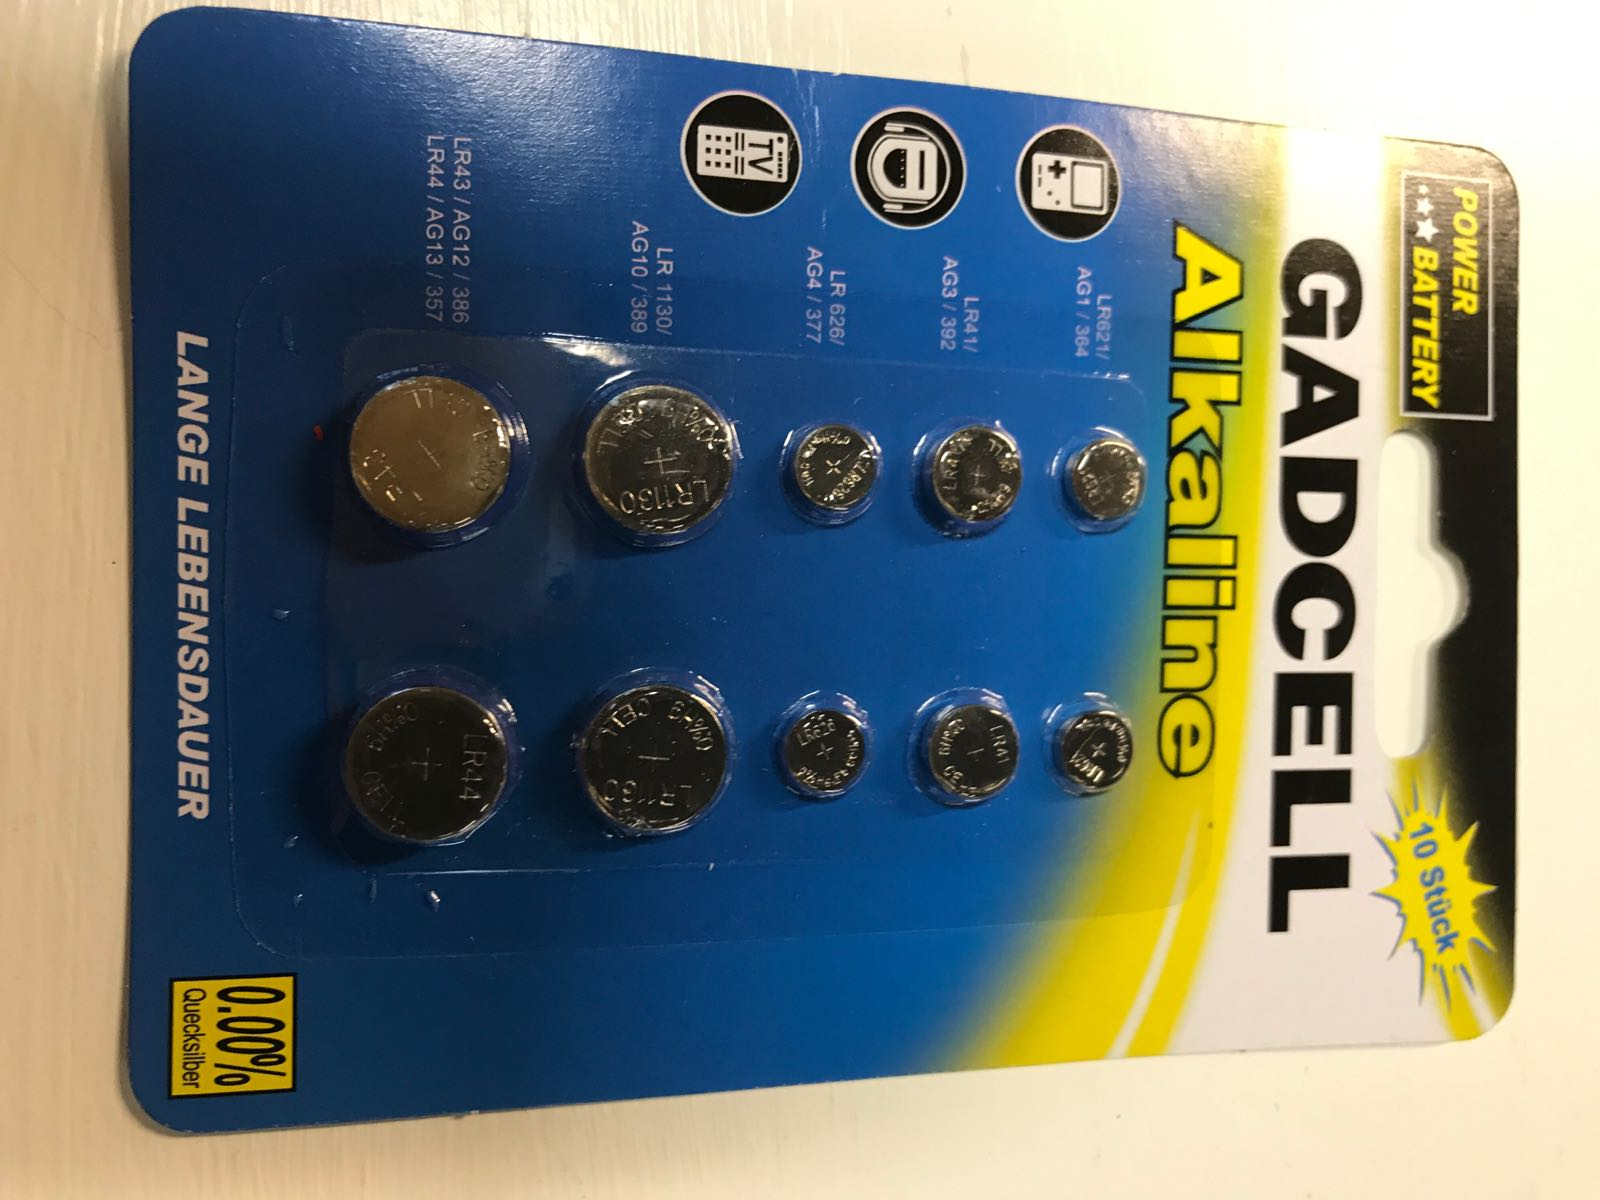 Batterier Buttoncell 10 st Alkaline (5 olika)